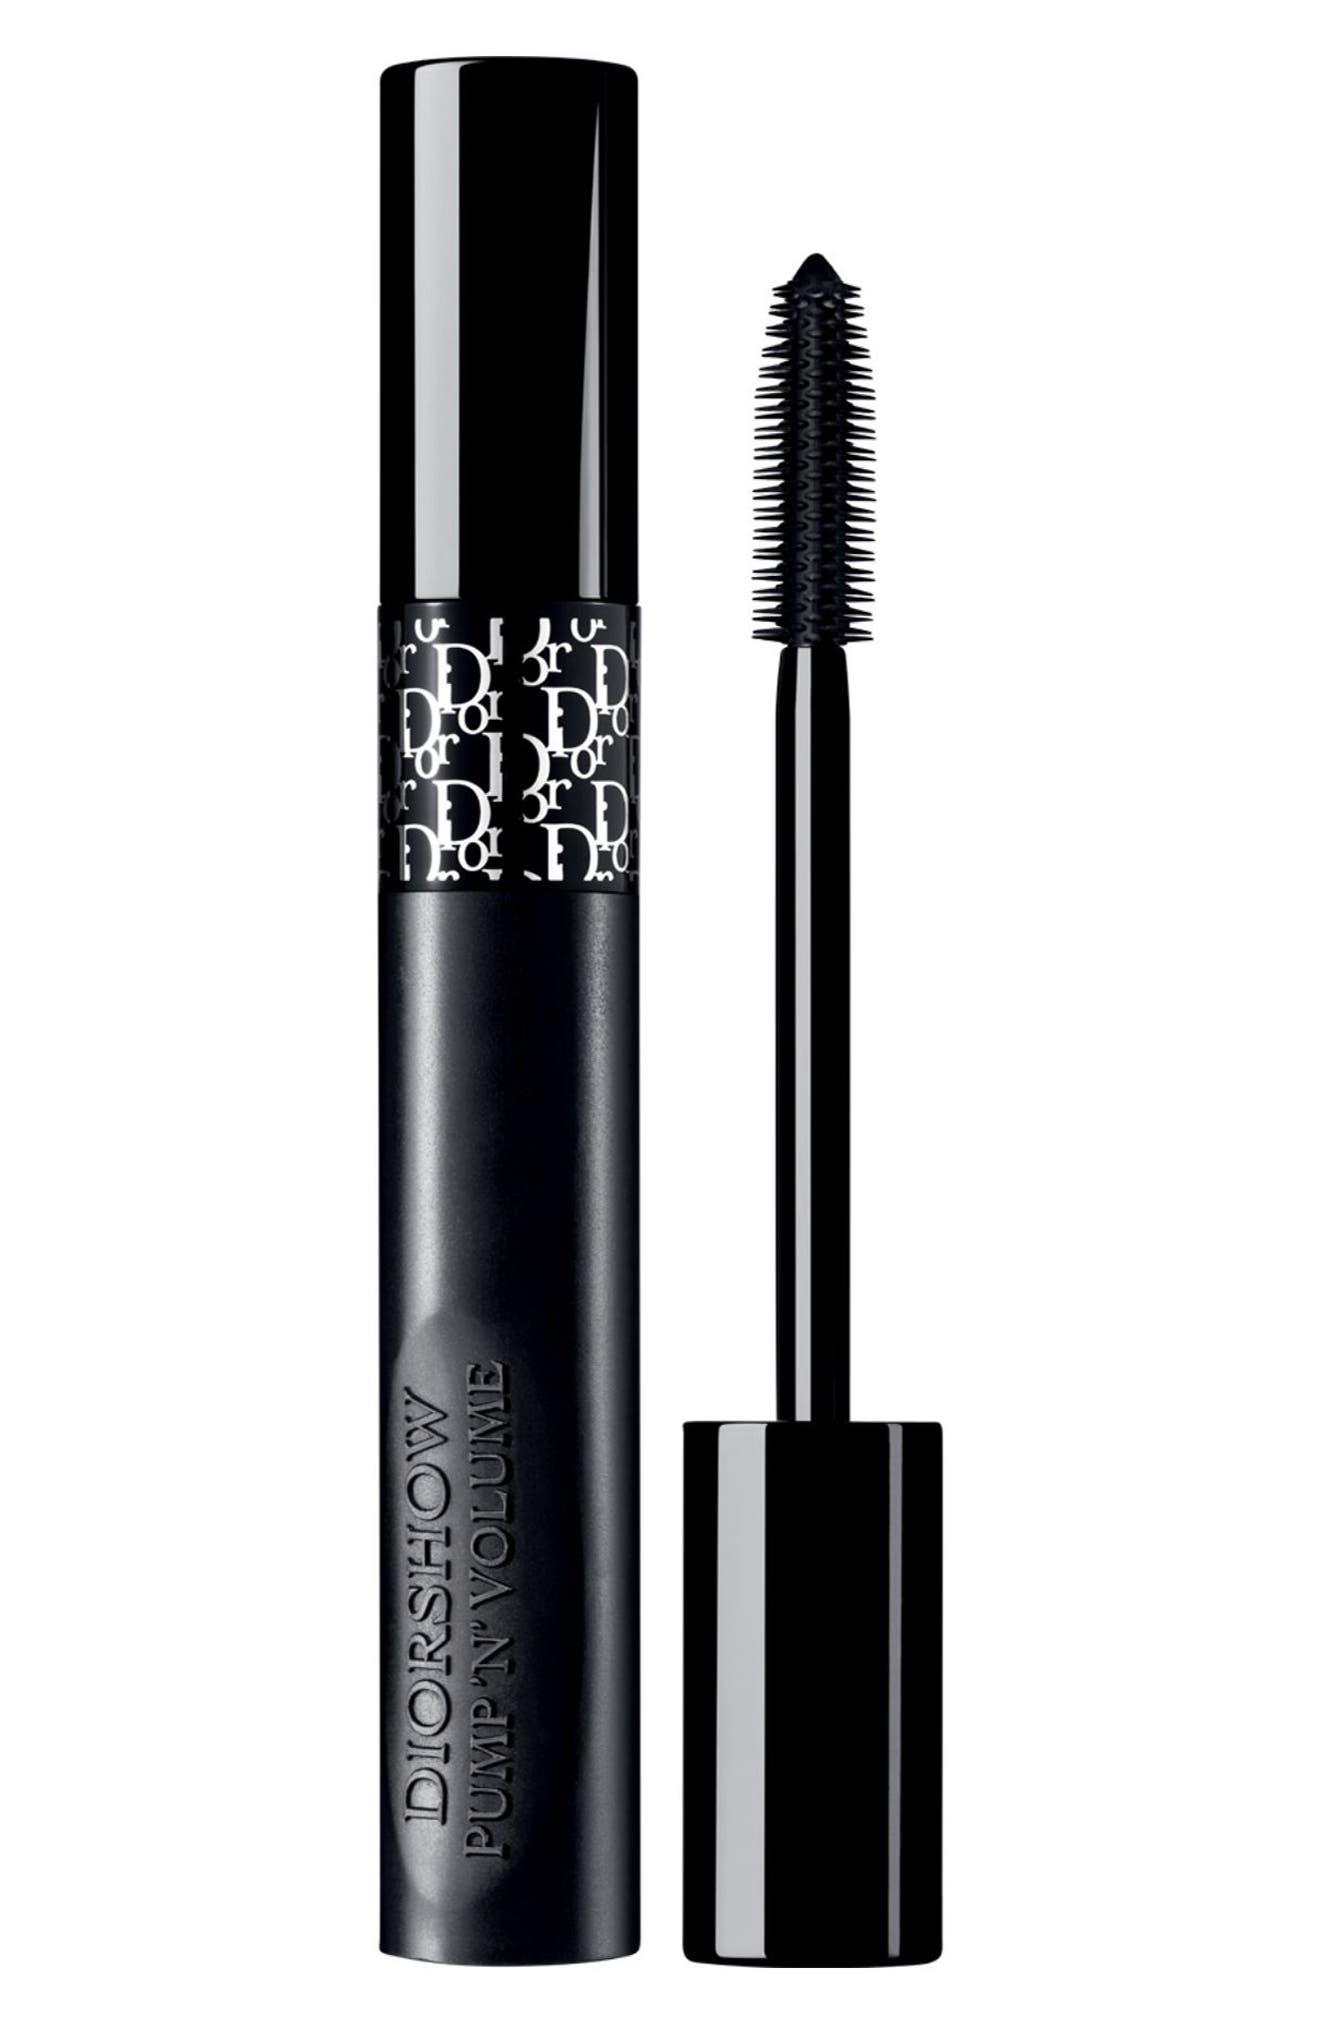 Dior Diorshow Pumpnvolume Instant Volume Squeezable Mascara - 090 Black Pump